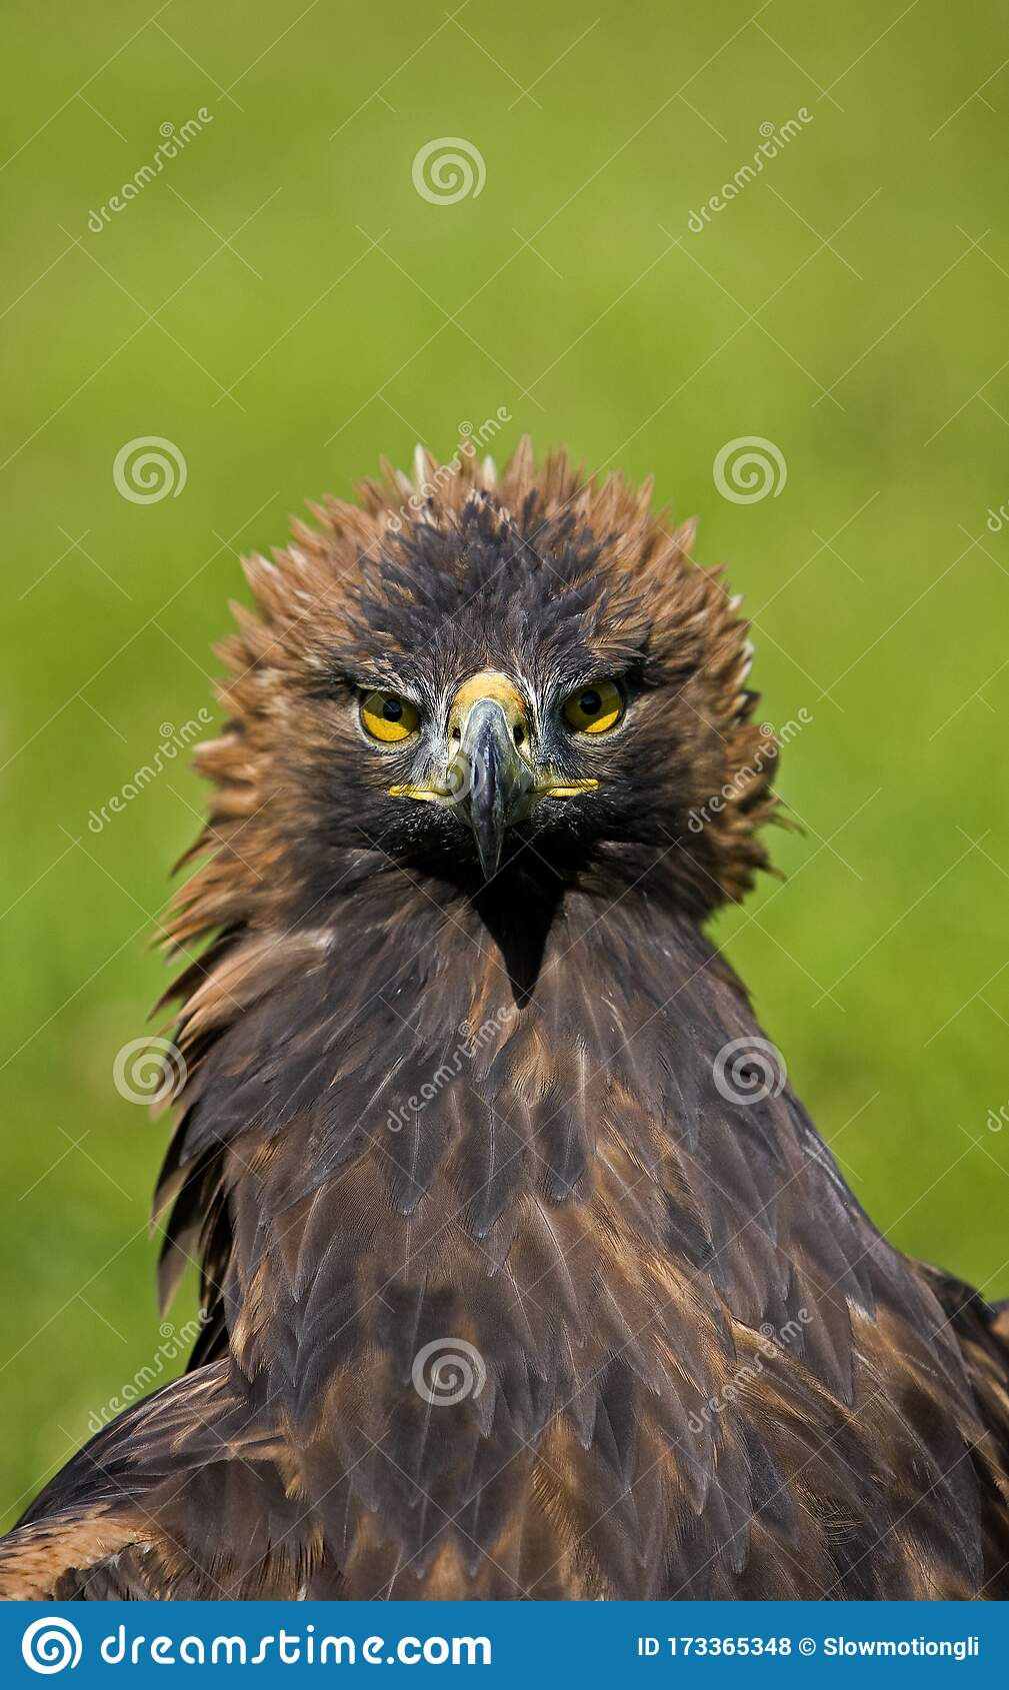 Aigle Royal Aquila Chrysaetos Stock Photo Image Of Prey Golden 173365348